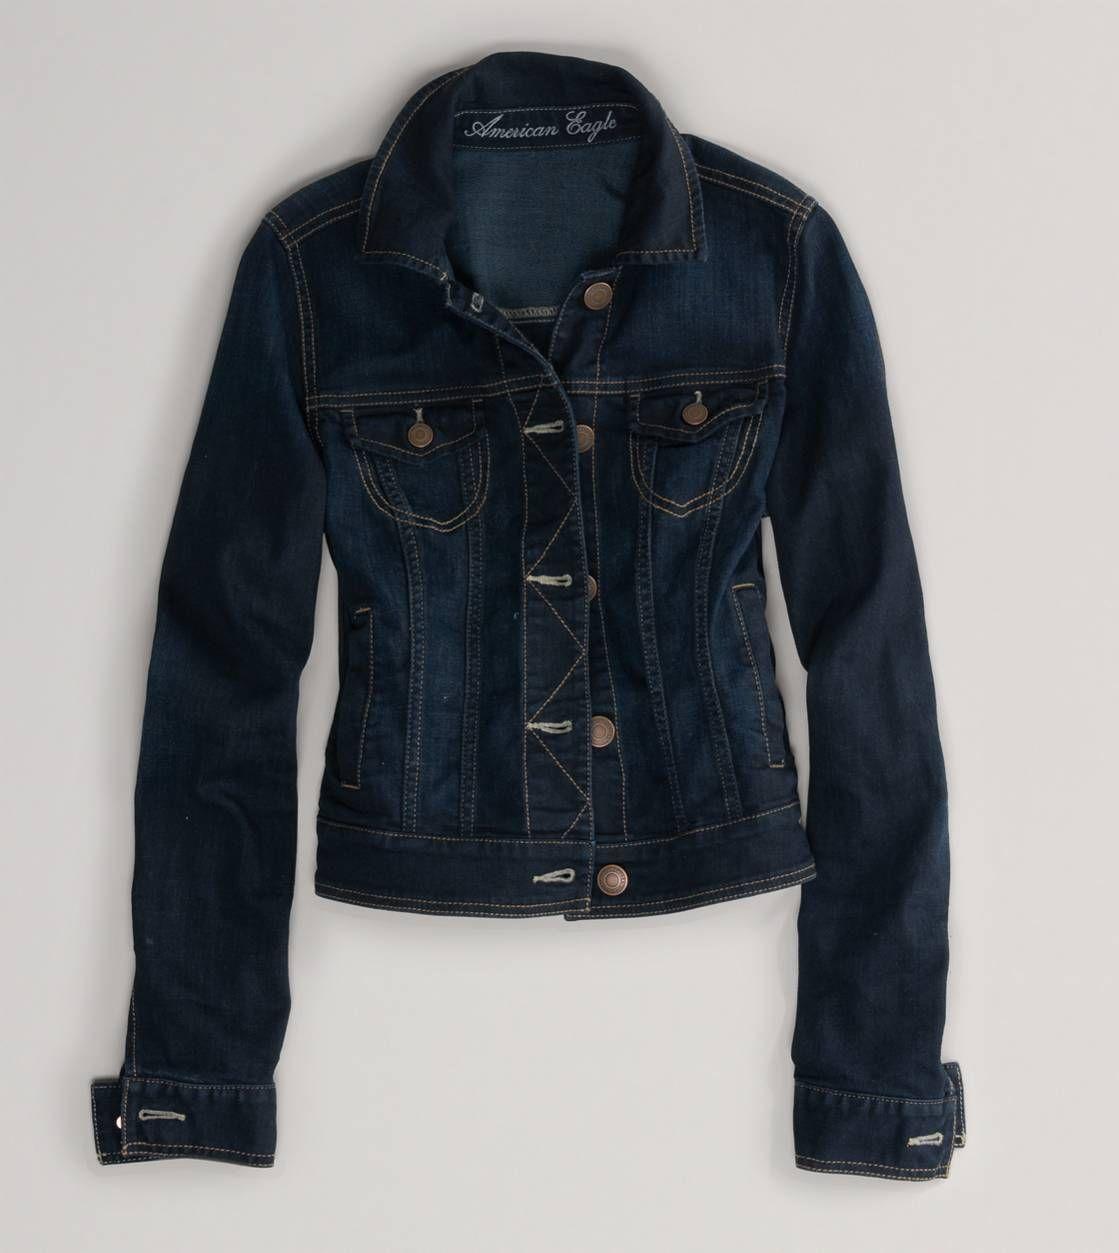 AEO Silver Linings Bomber Jacket | Dark denim jacket, Dark denim ...